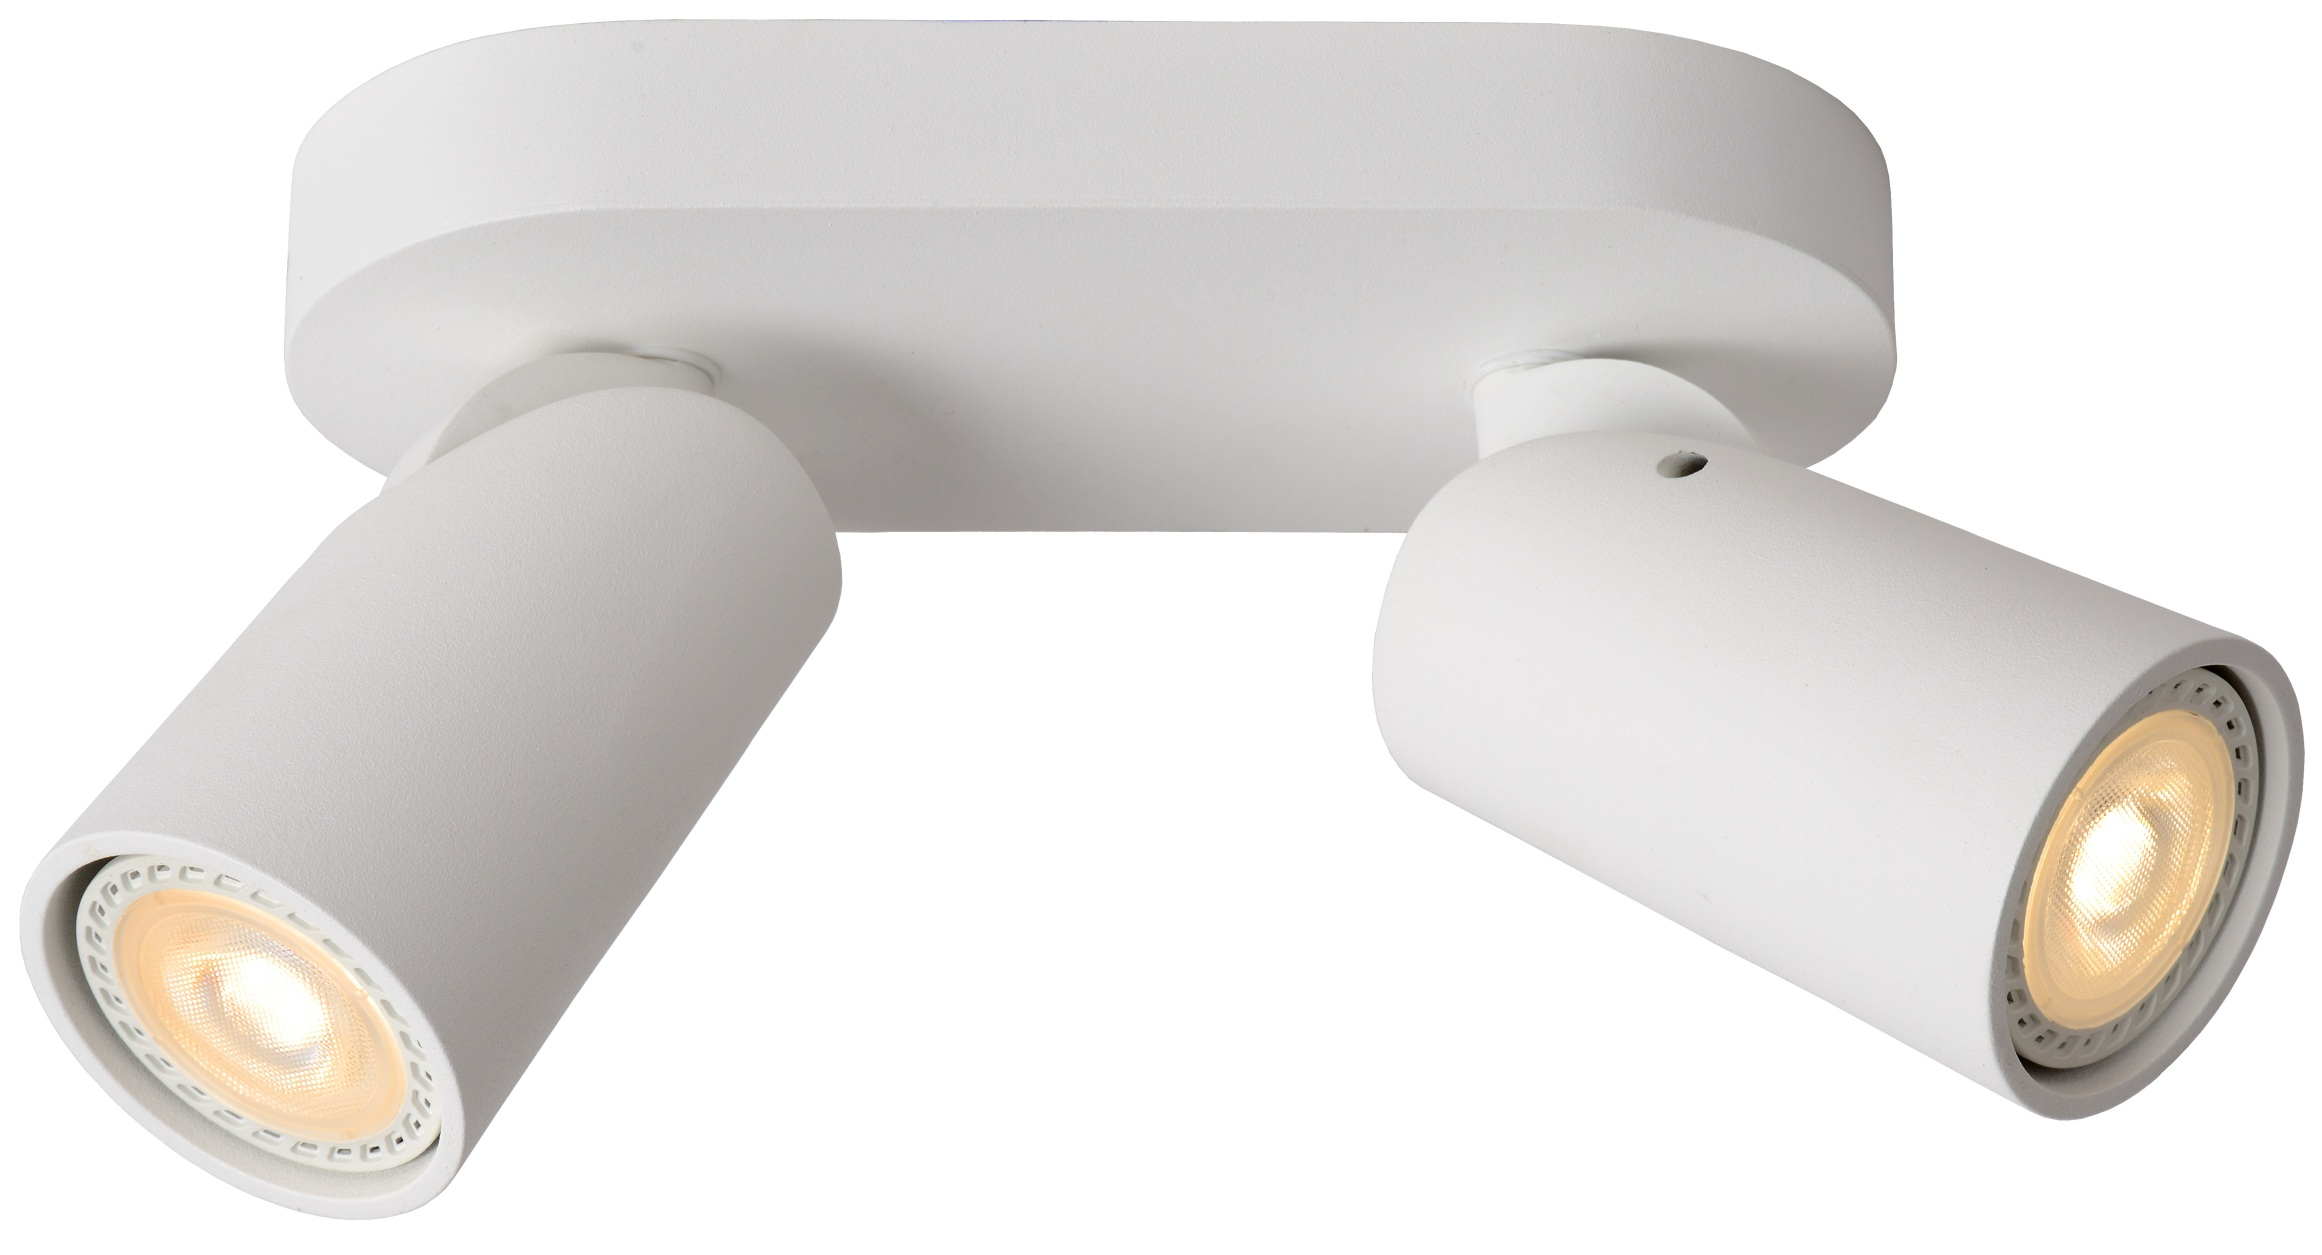 Lucide Plafondspot Xyrus 2 Lichts - Dimbare LED - Wit